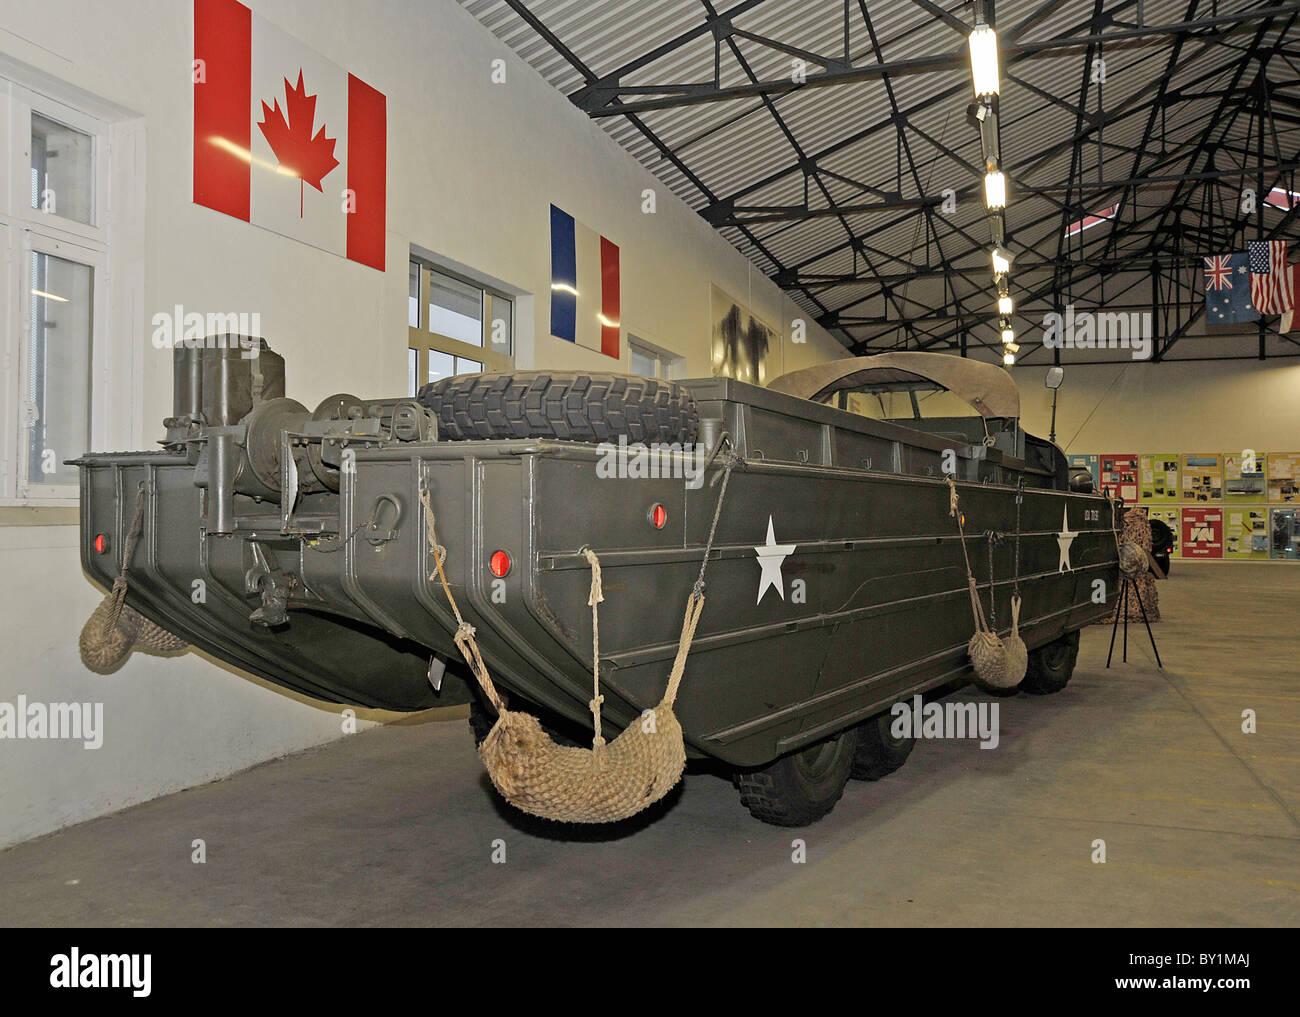 WW2 American amphibious troop carrier on display at Saumur ...